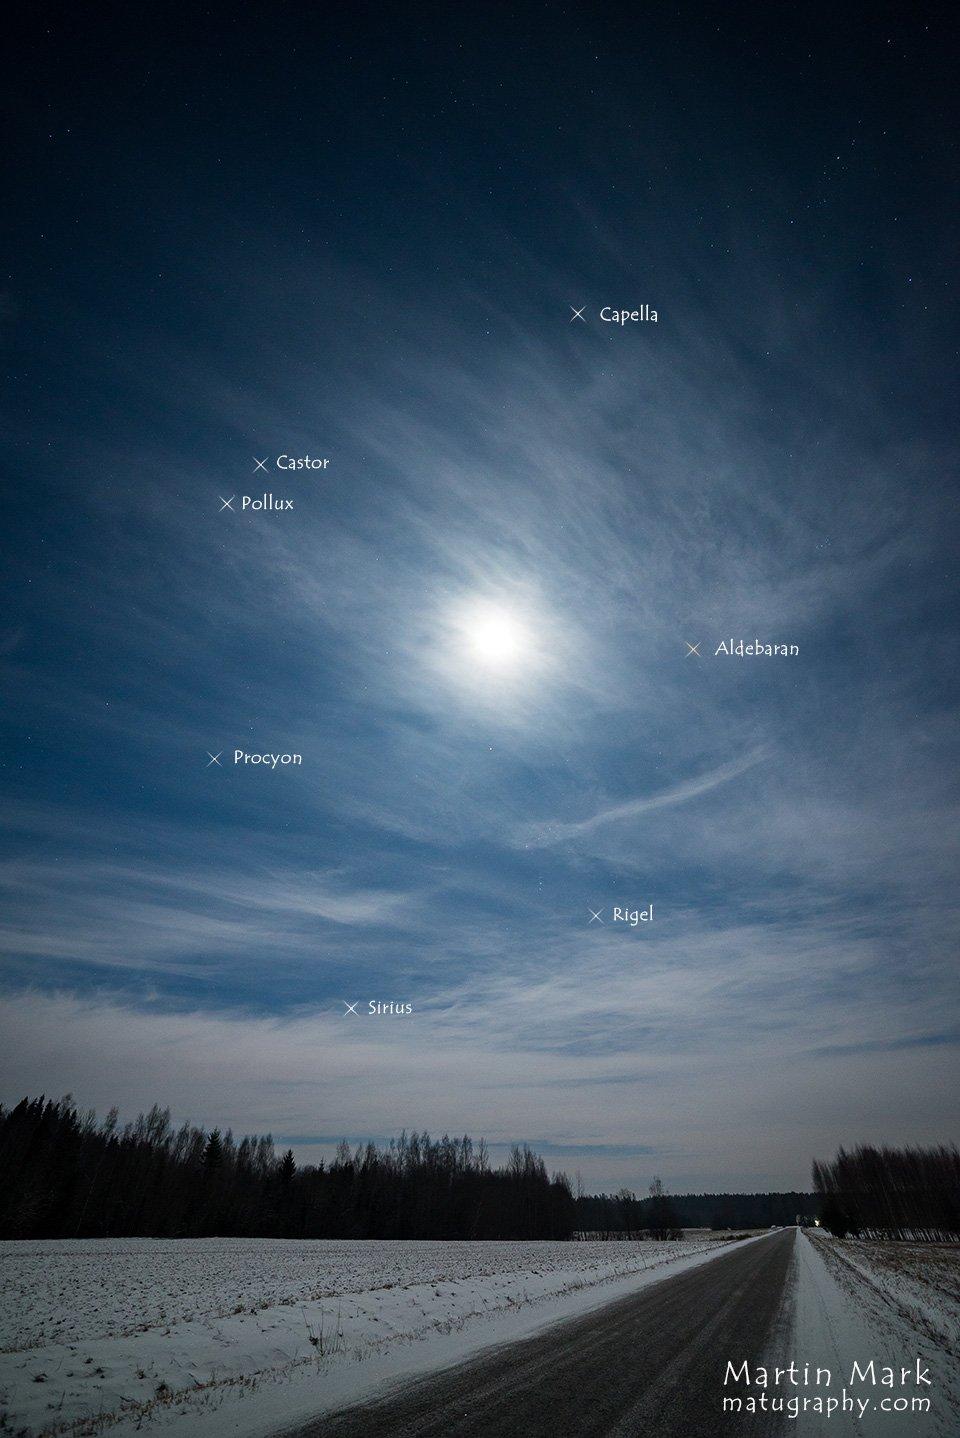 Talvekuusnurk ja Kuu